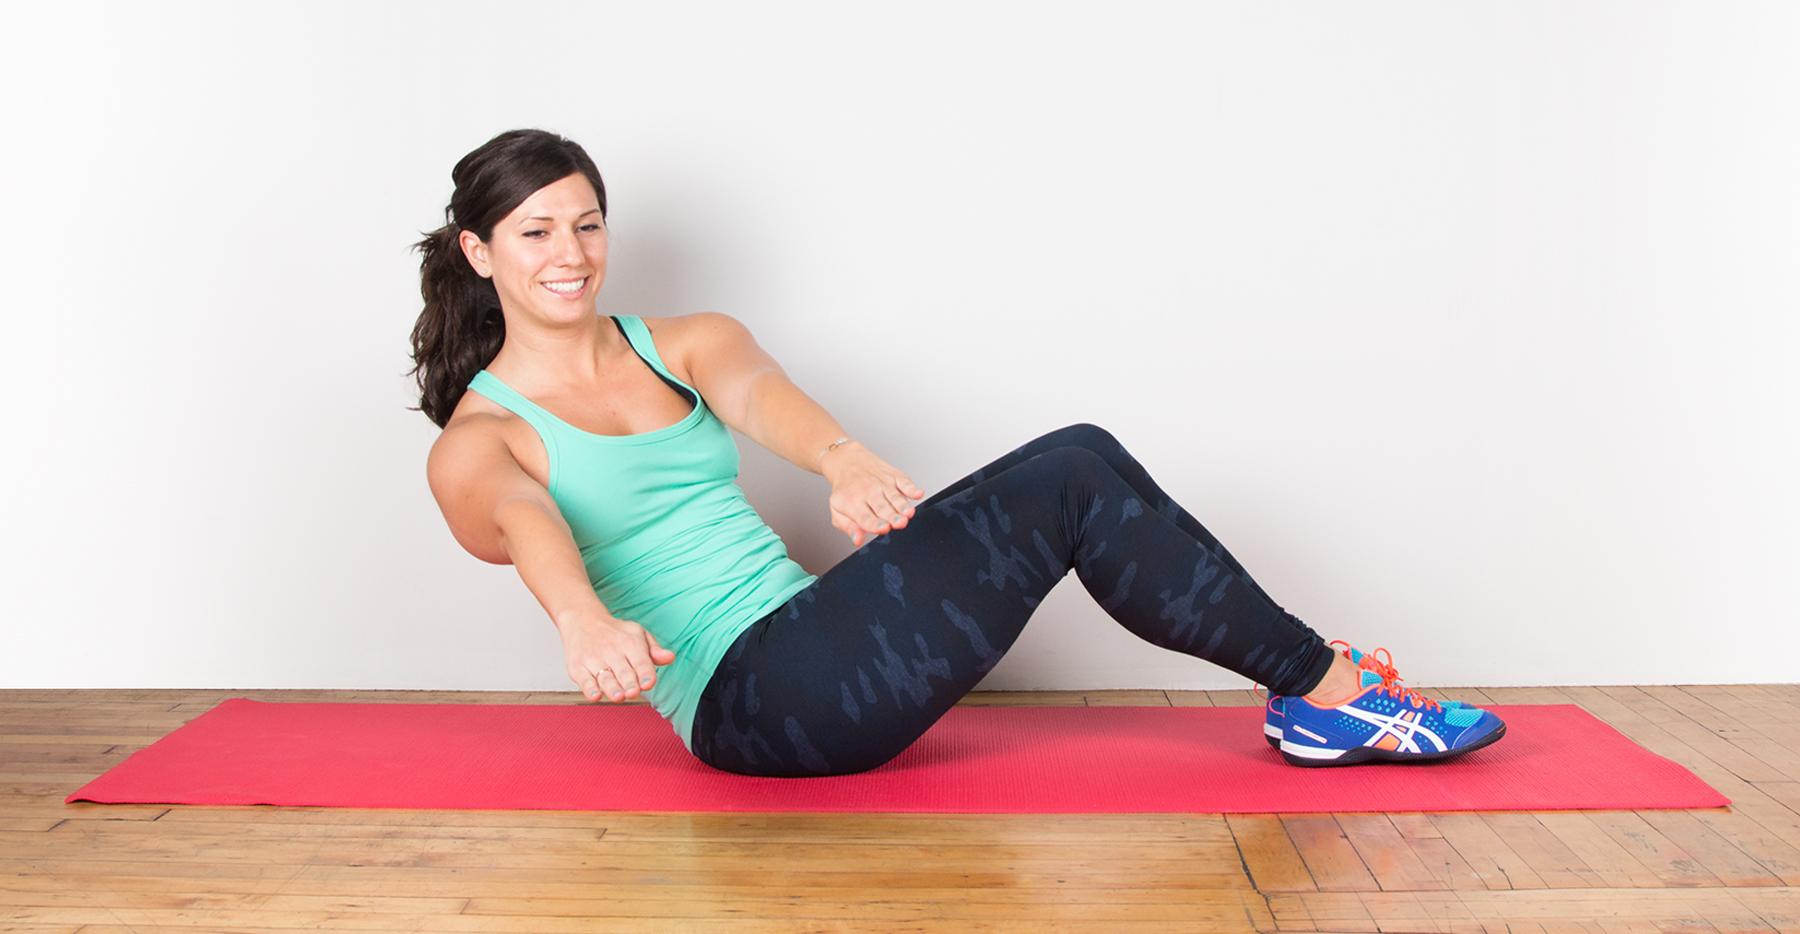 Build Big Quads Quadriceps Training For Size And Definition